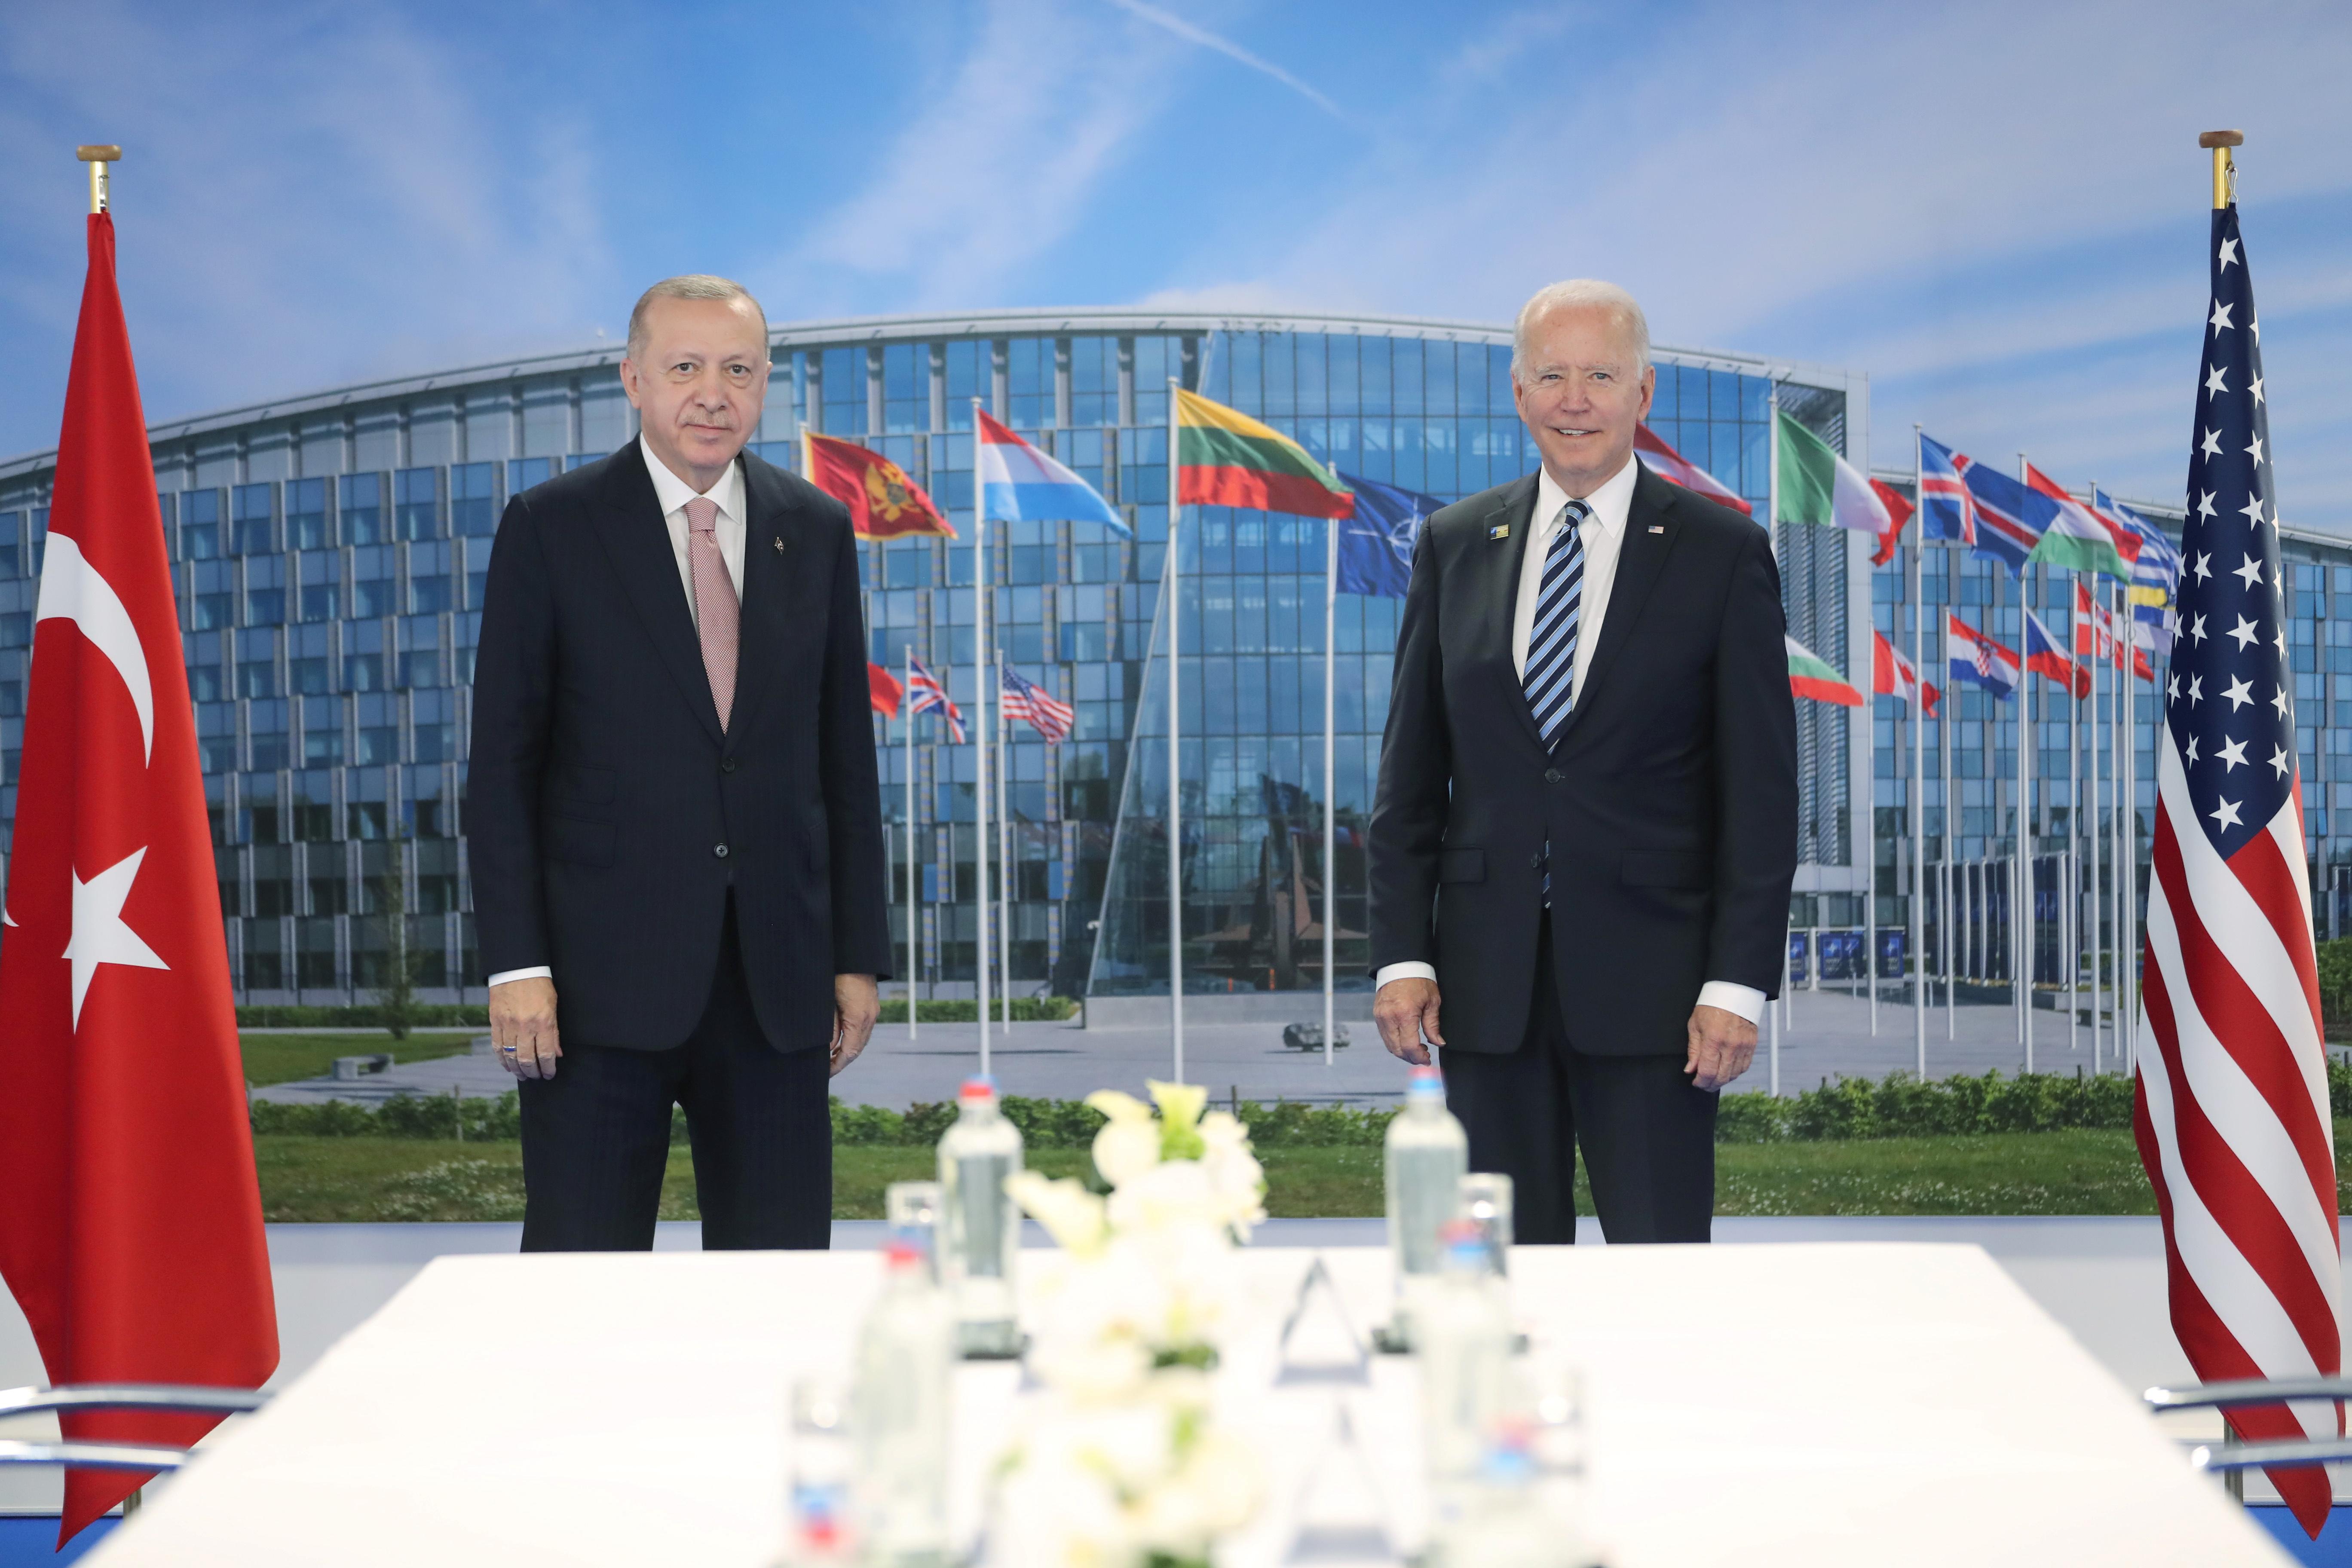 Turkish President Tayyip Erdogan meets with U.S. President Joe Biden on the sidelines of the NATO summit in Brussels, Belgium June 14, 2021. Murat Cetinmuhurdar/Presidential Press Office/Handout via REUTERS